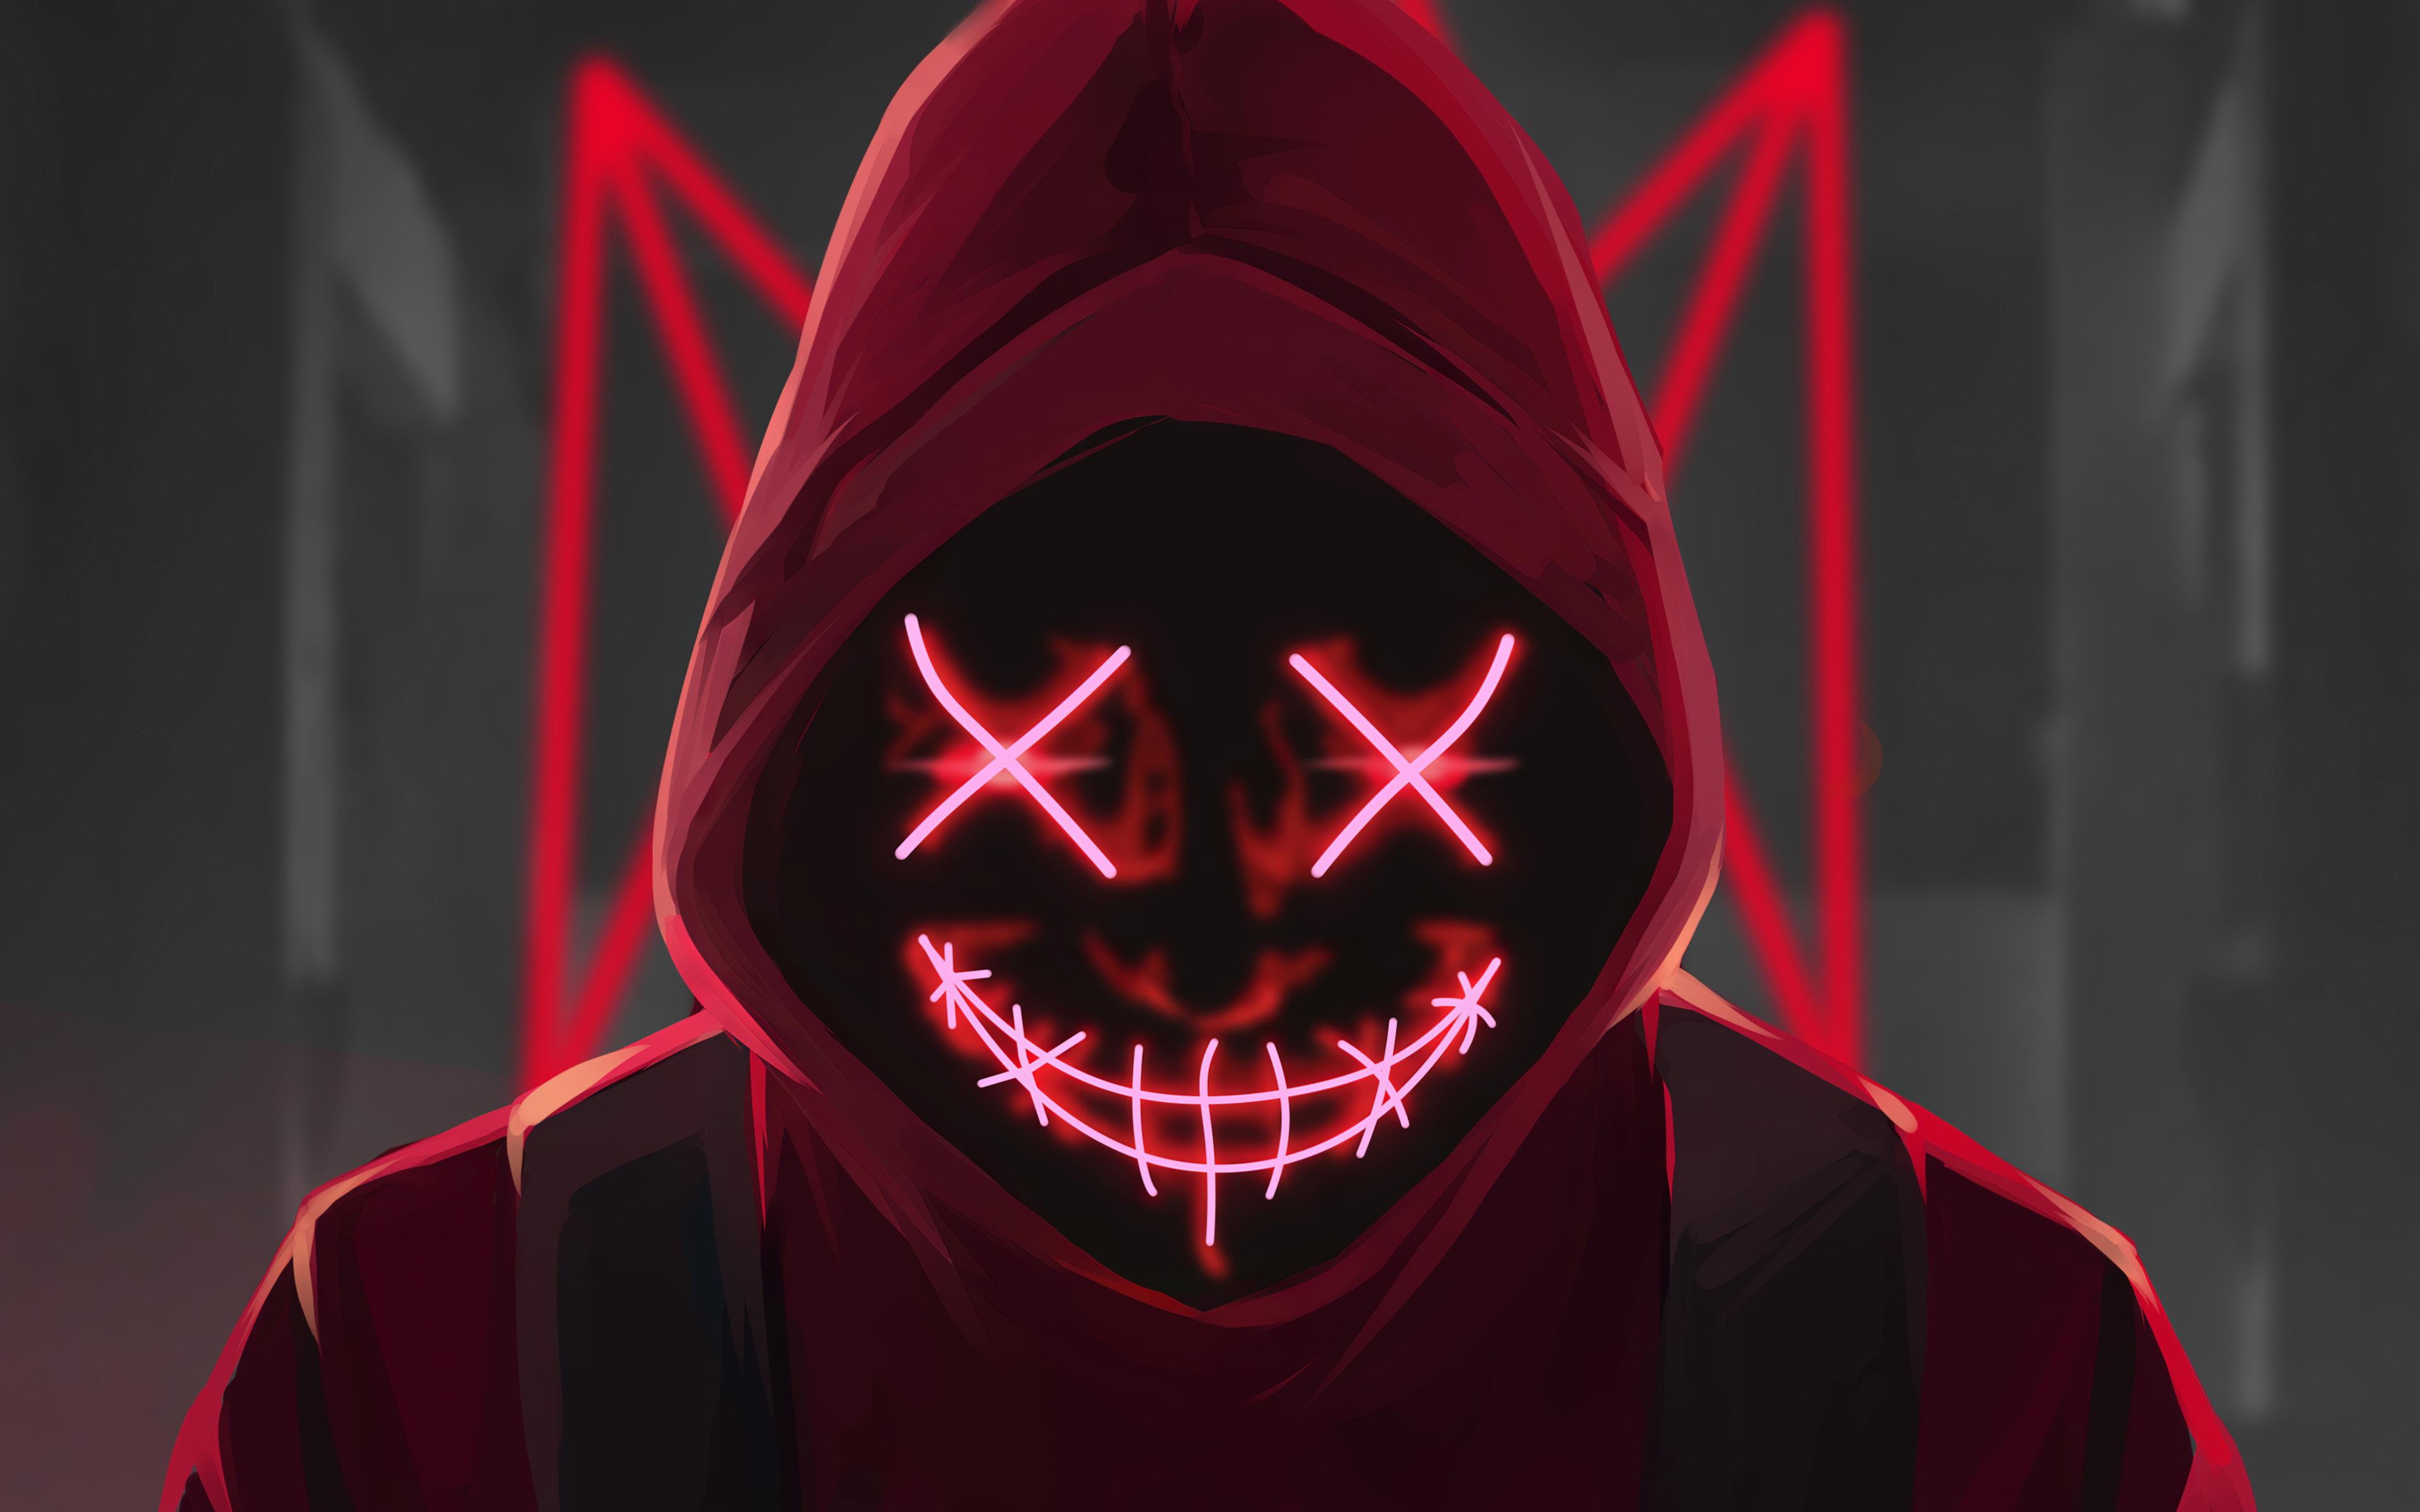 red-mask-neon-eyes-4k-0k.jpg